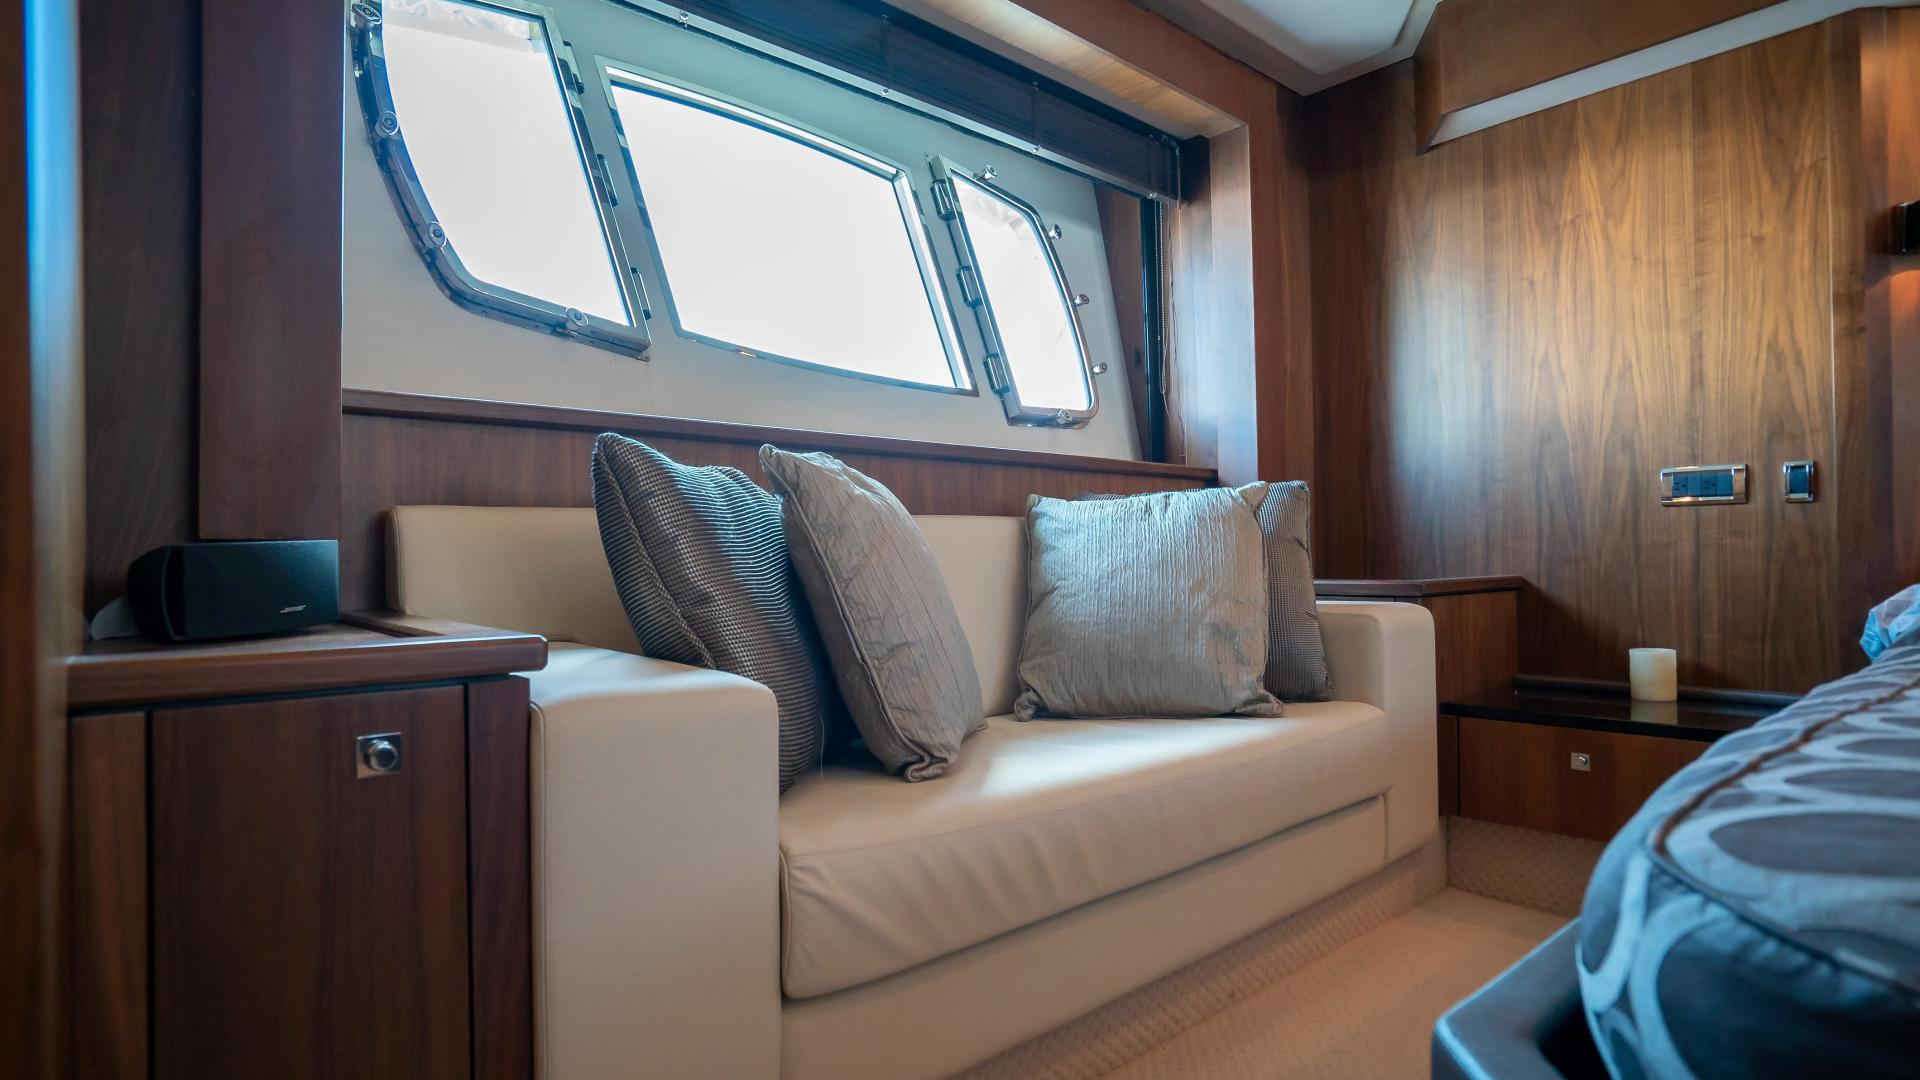 Sunseeker-Motor yacht 2012-JIMBO New Port-Rhode Island-United States-1480164   Thumbnail